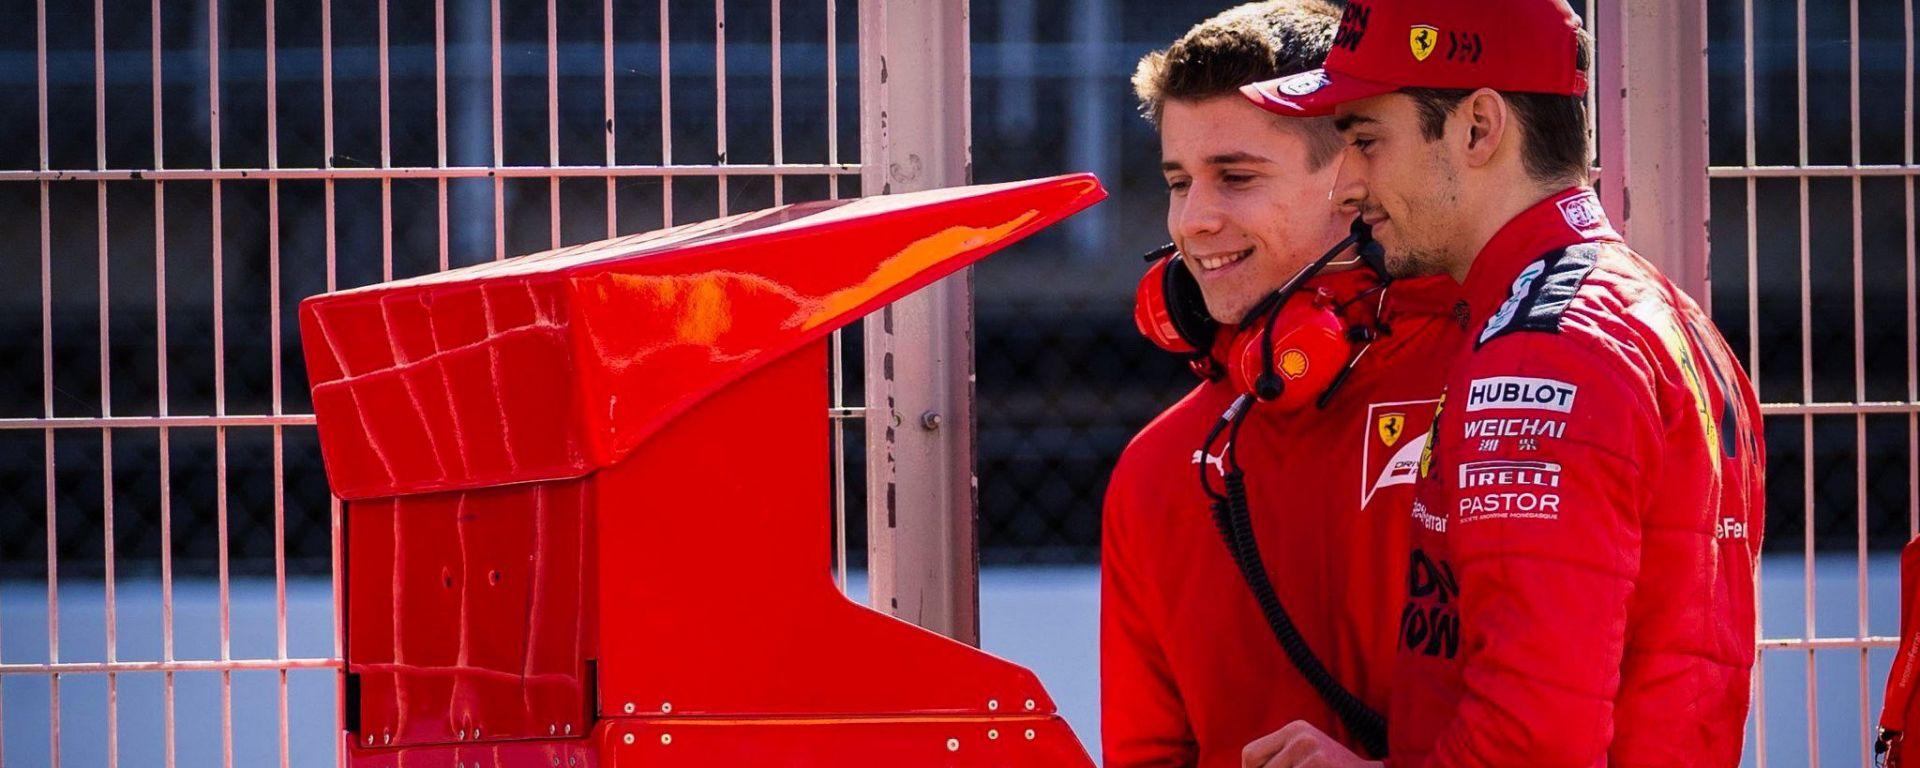 F1 2020: Charles Leclerc (Ferrari) e il fratello Arthur